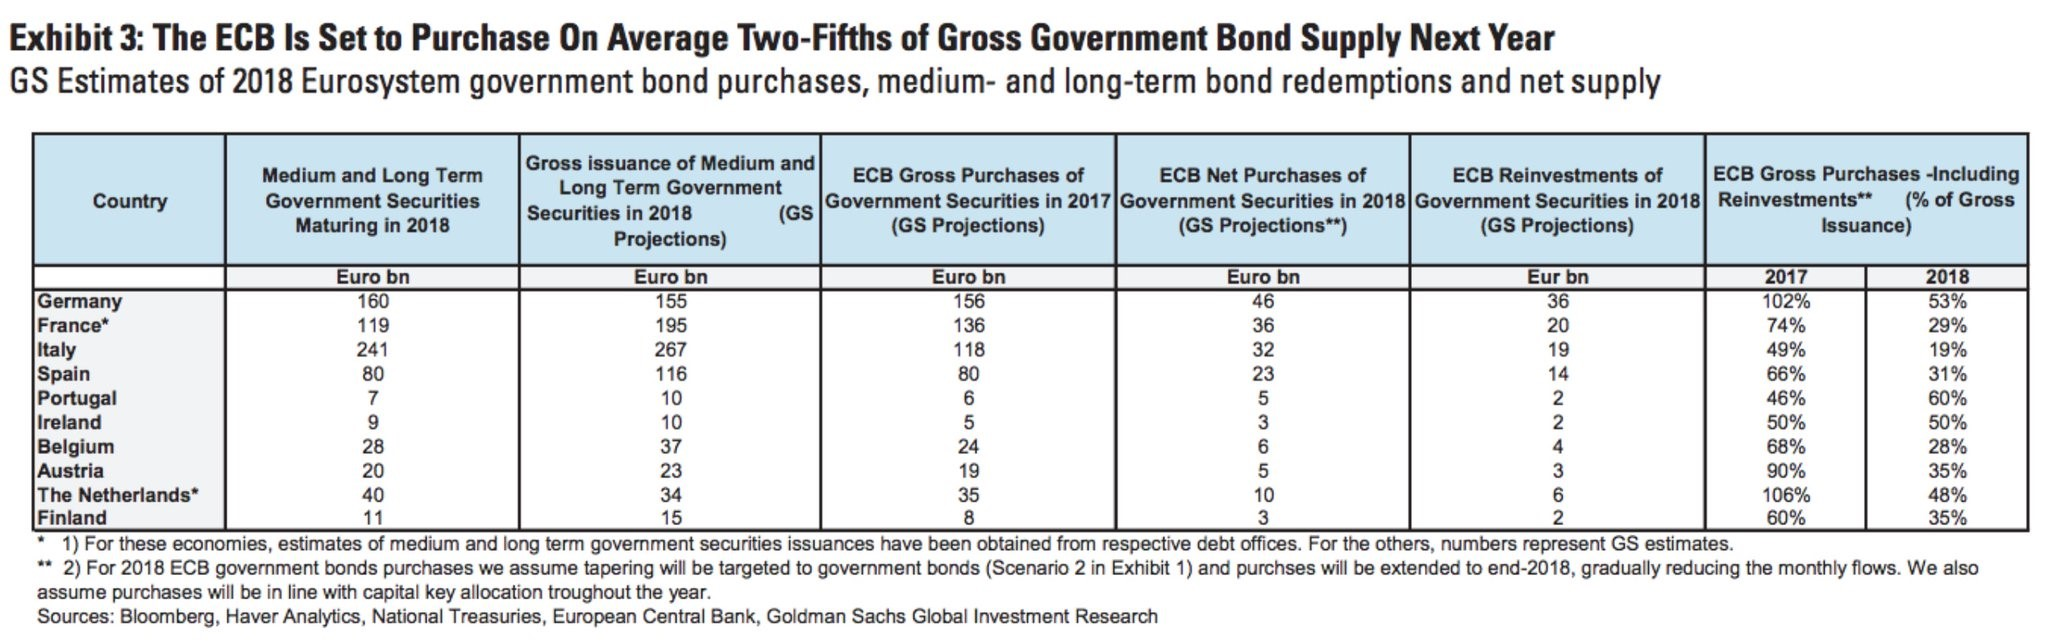 Goldman Sachs' ECB Forecast